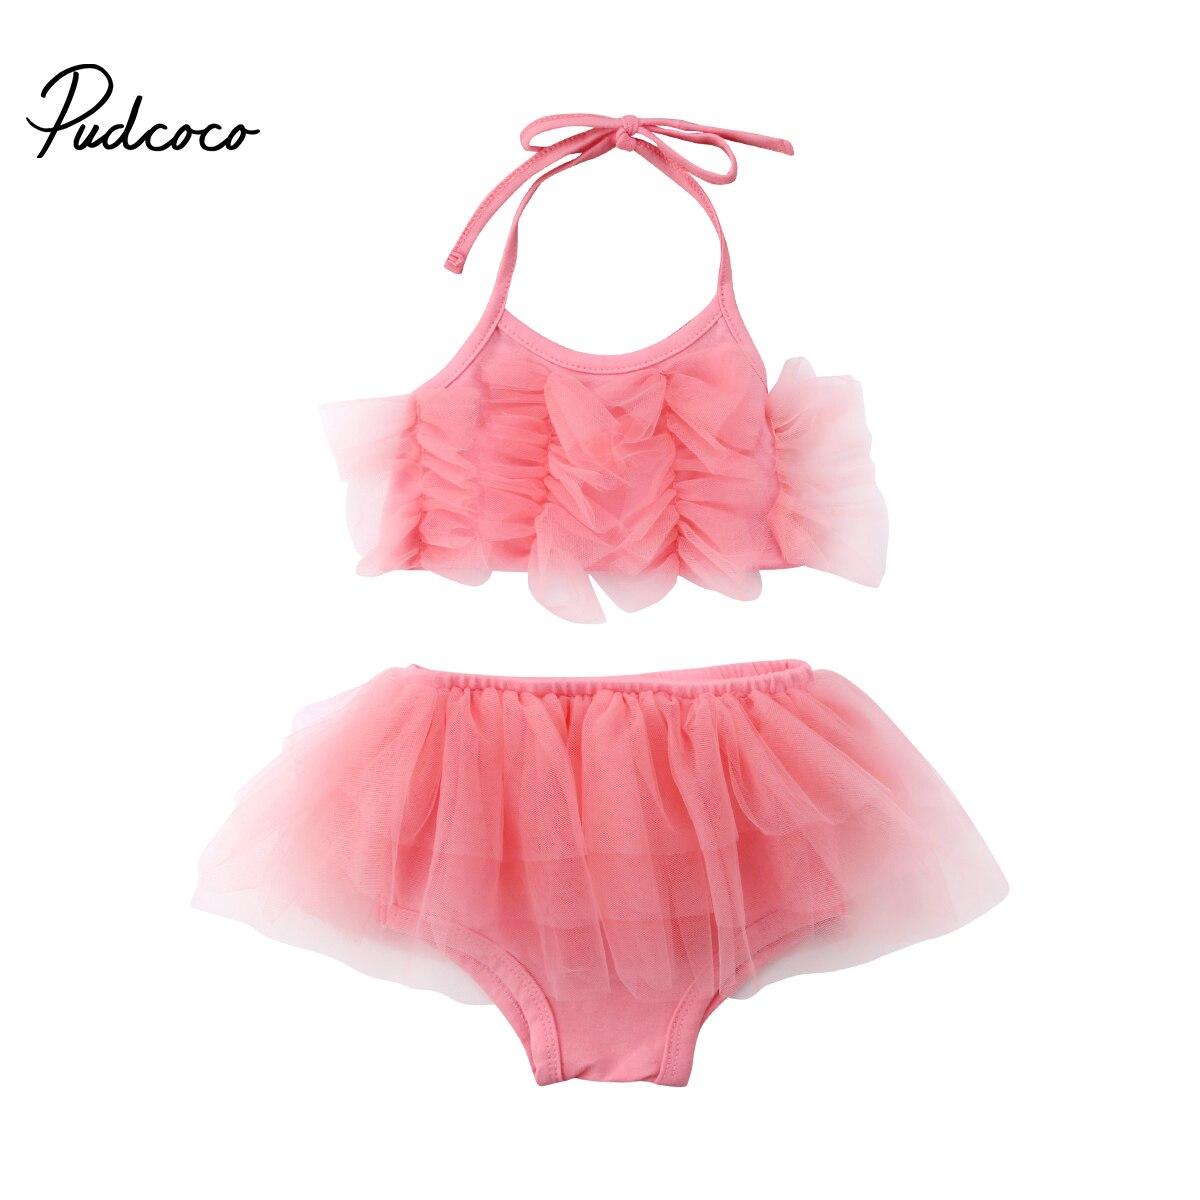 Pudcoco Newborn Baby Girl Clothes Sleeveless Tulle Halter Tops+Ruffle Tutu Shorts Pants Lace Infant Children Clothing 2pcs